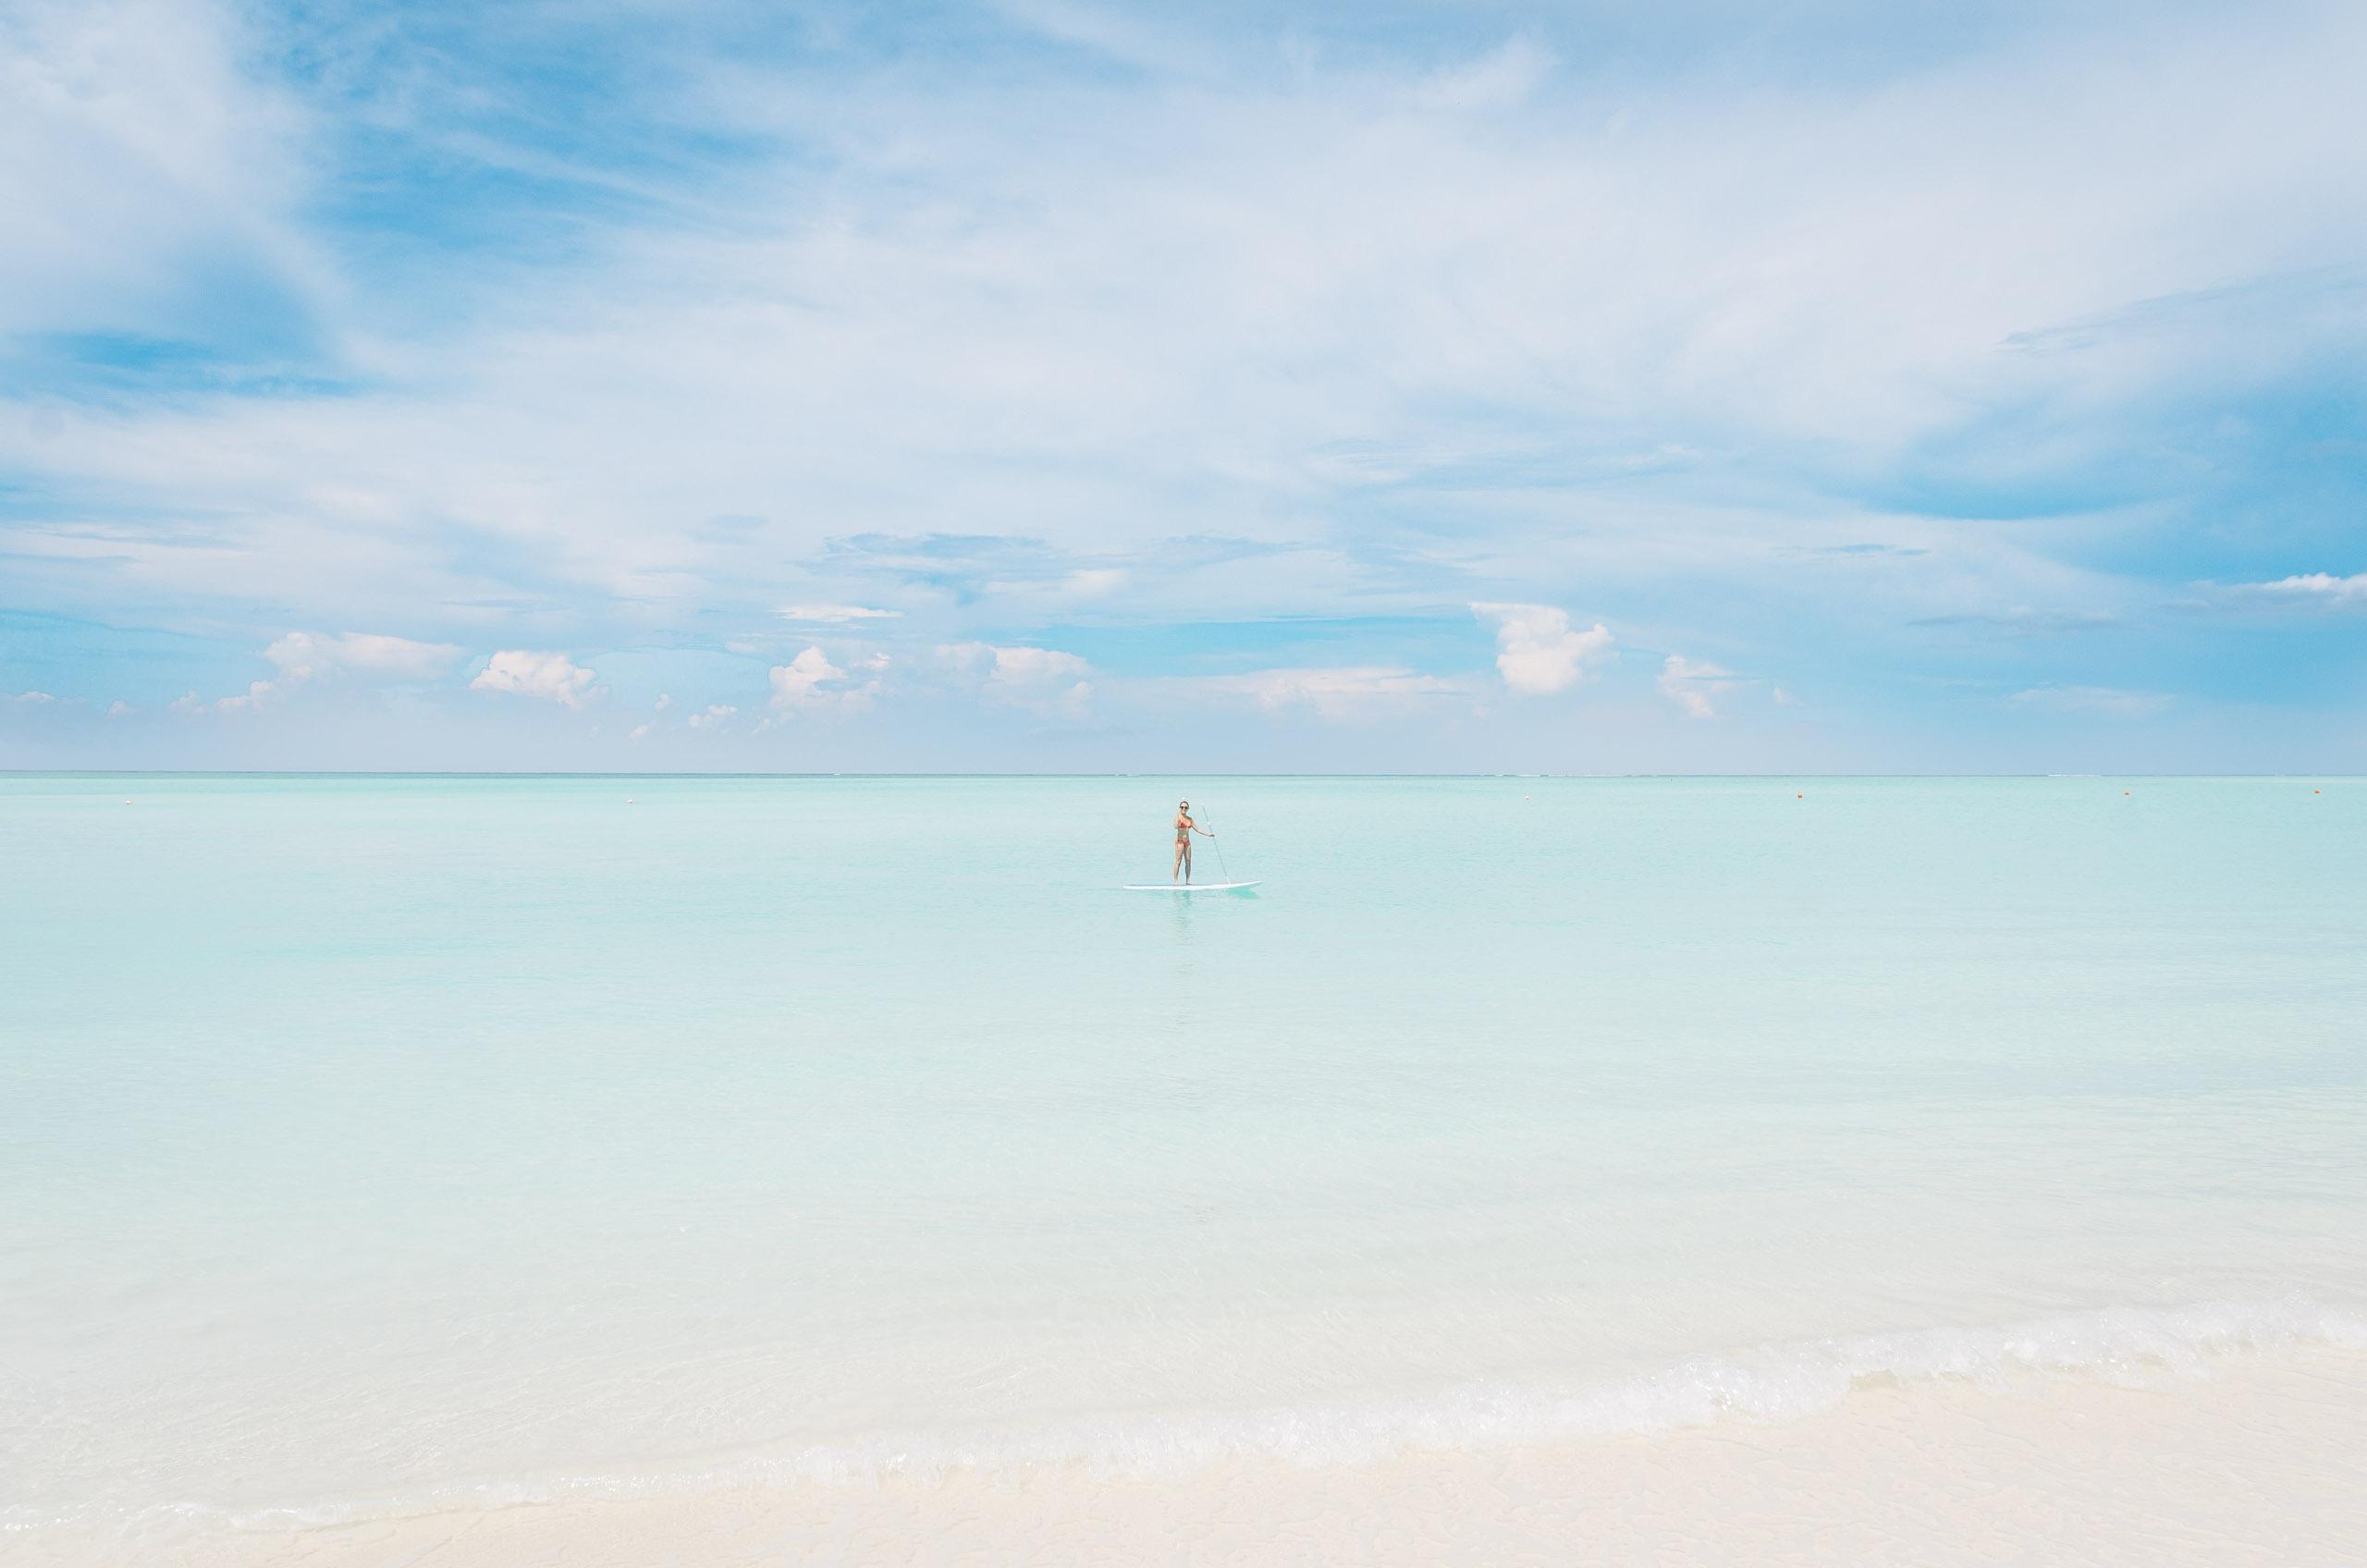 Parrot Cay - Turks & Caicos - 2011-1013-_KPK0988